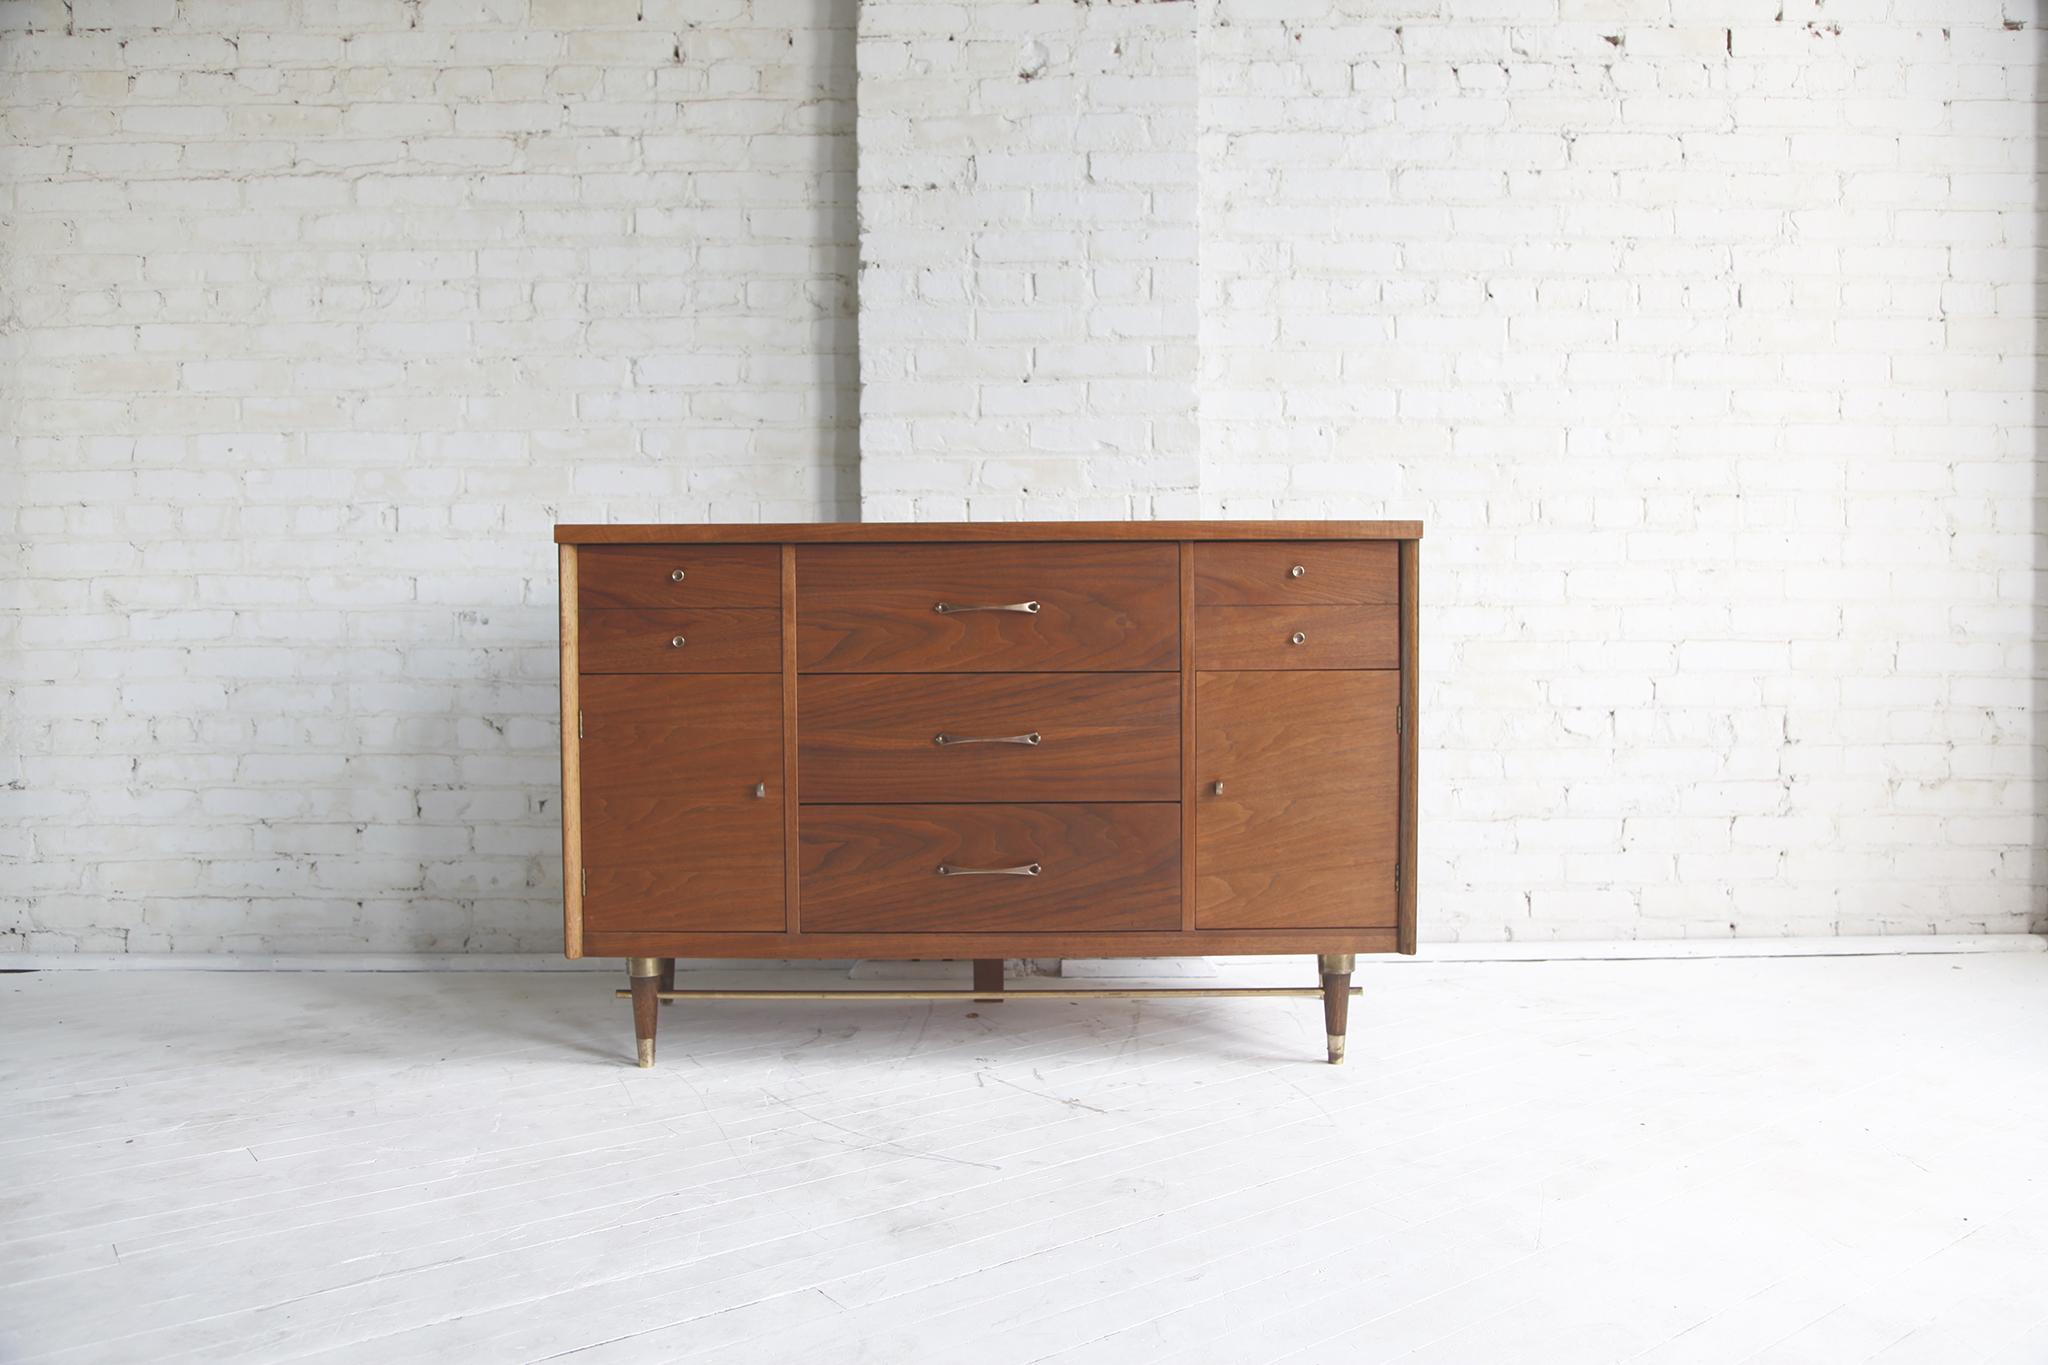 Sold Mid Century Modern Credenza By Bassett Furniture